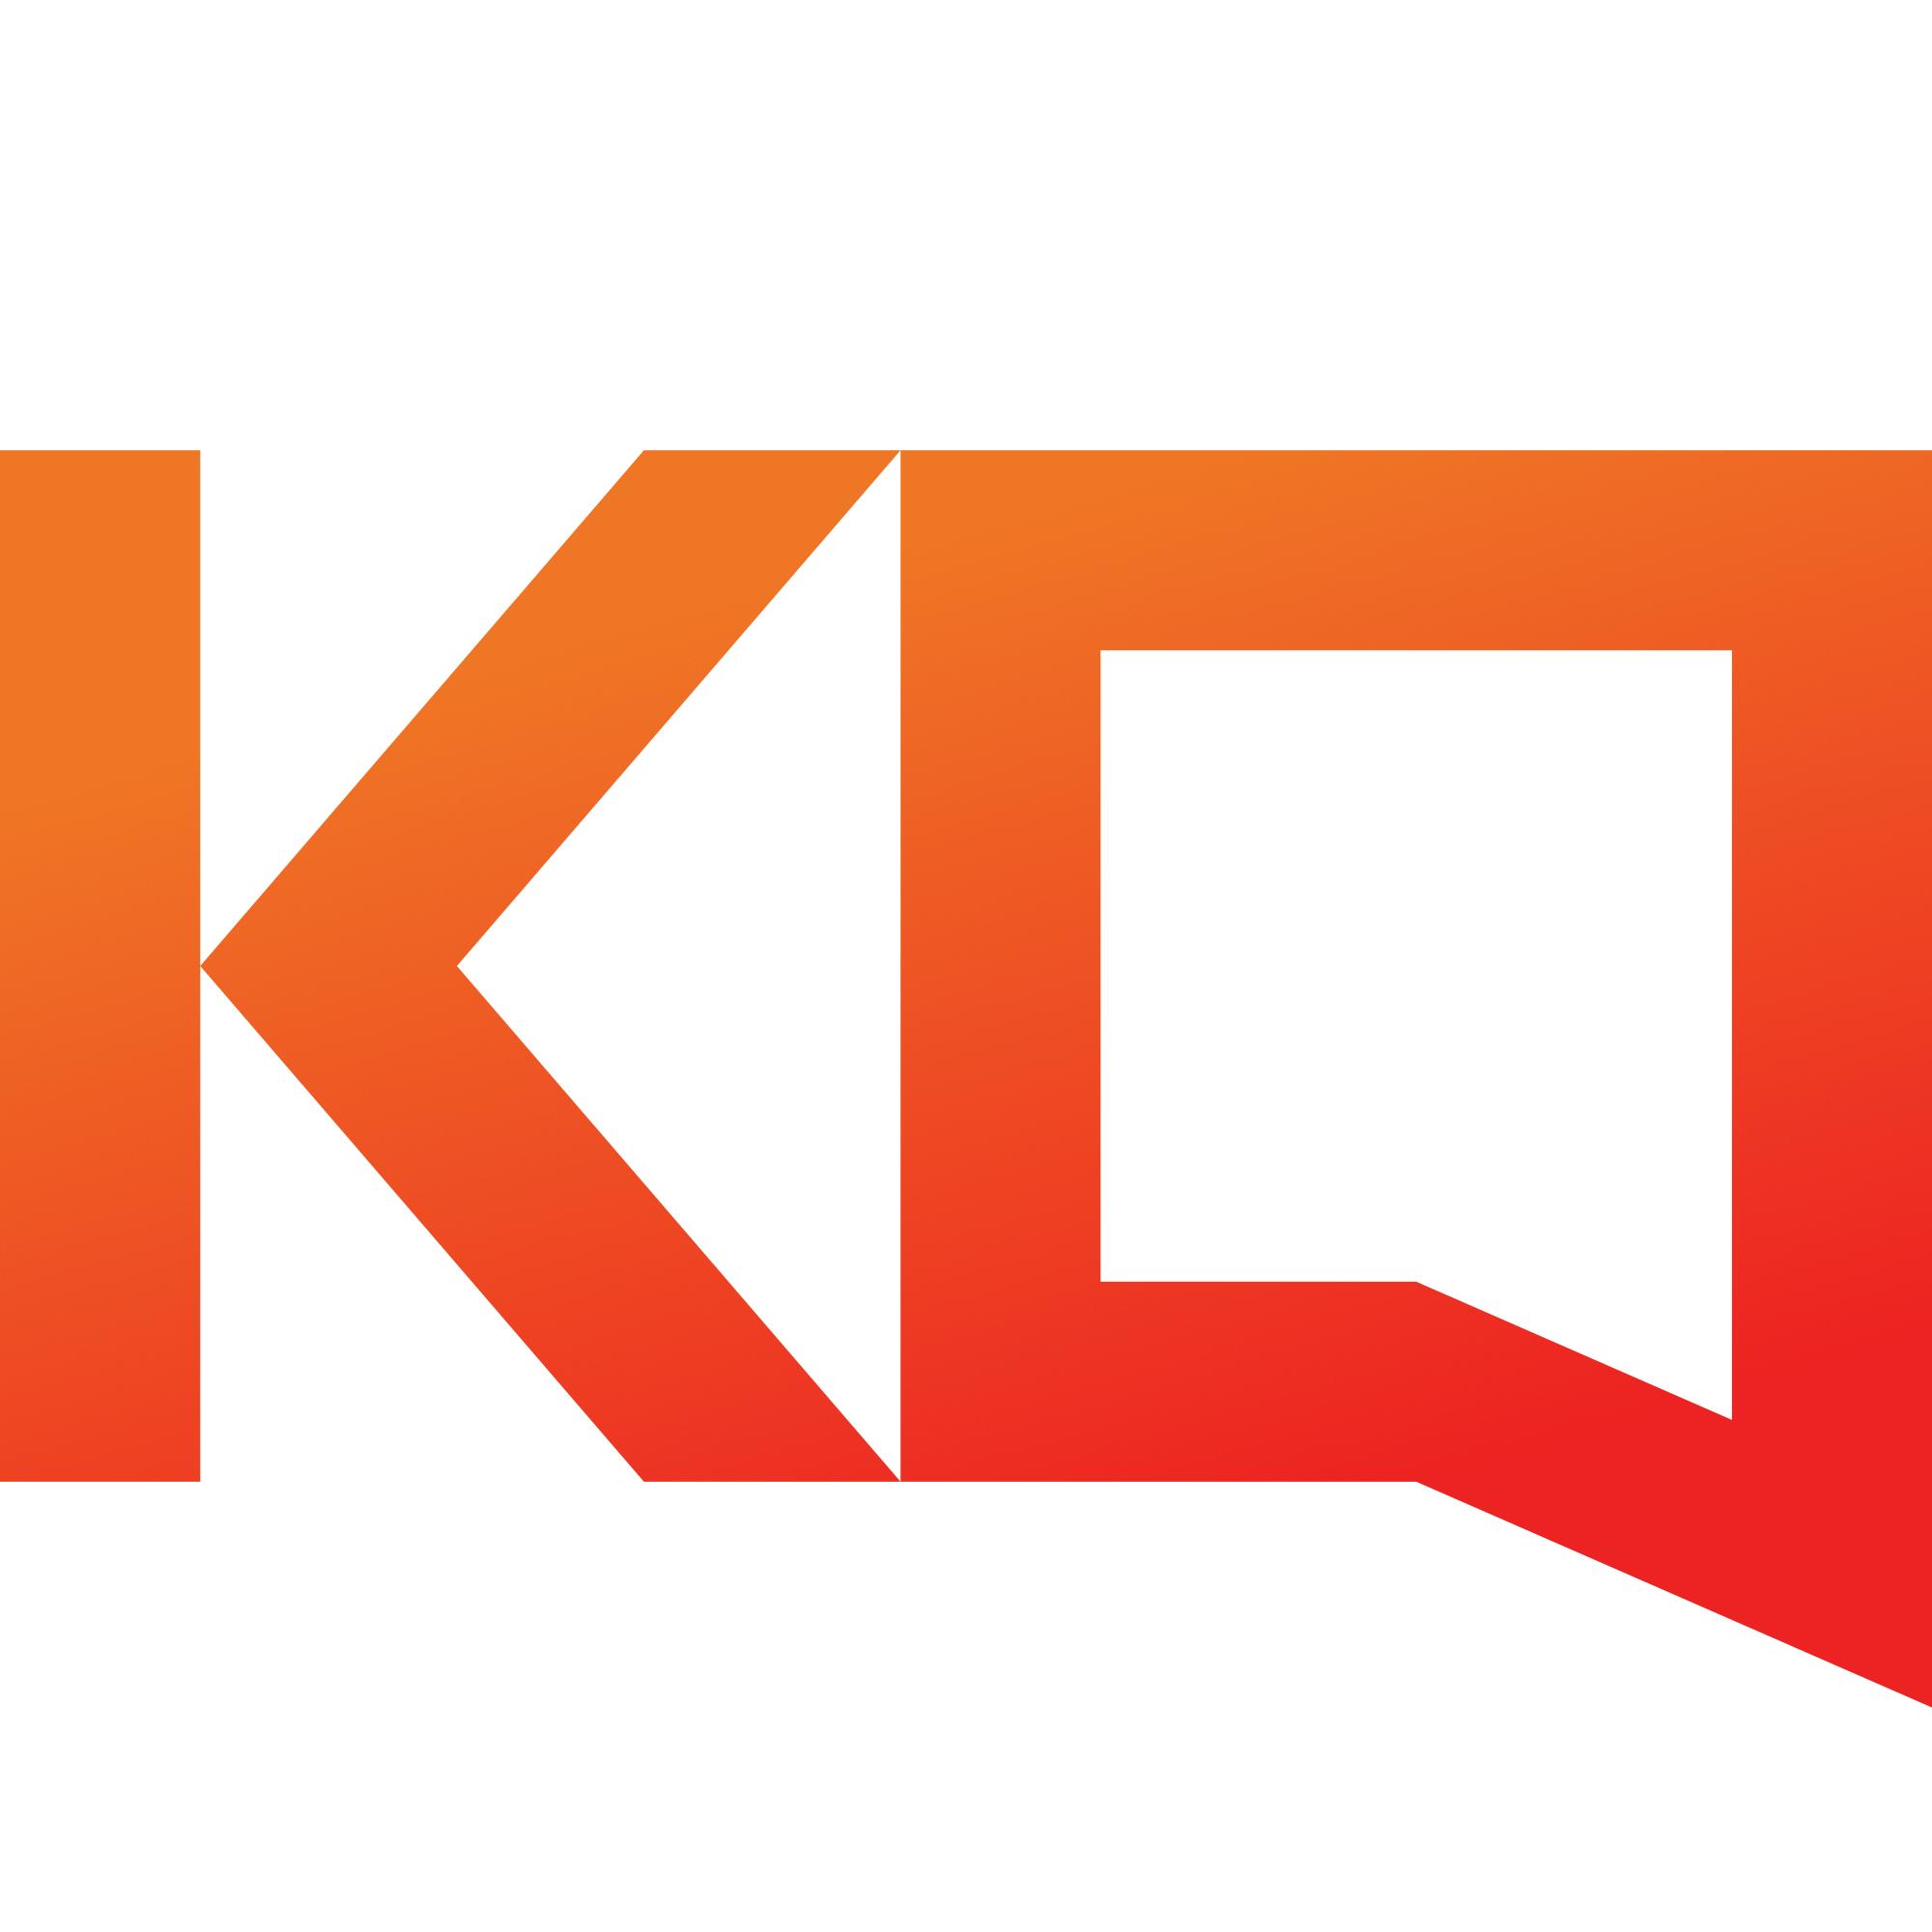 Proper Digit Separators In C Dev Krzaq